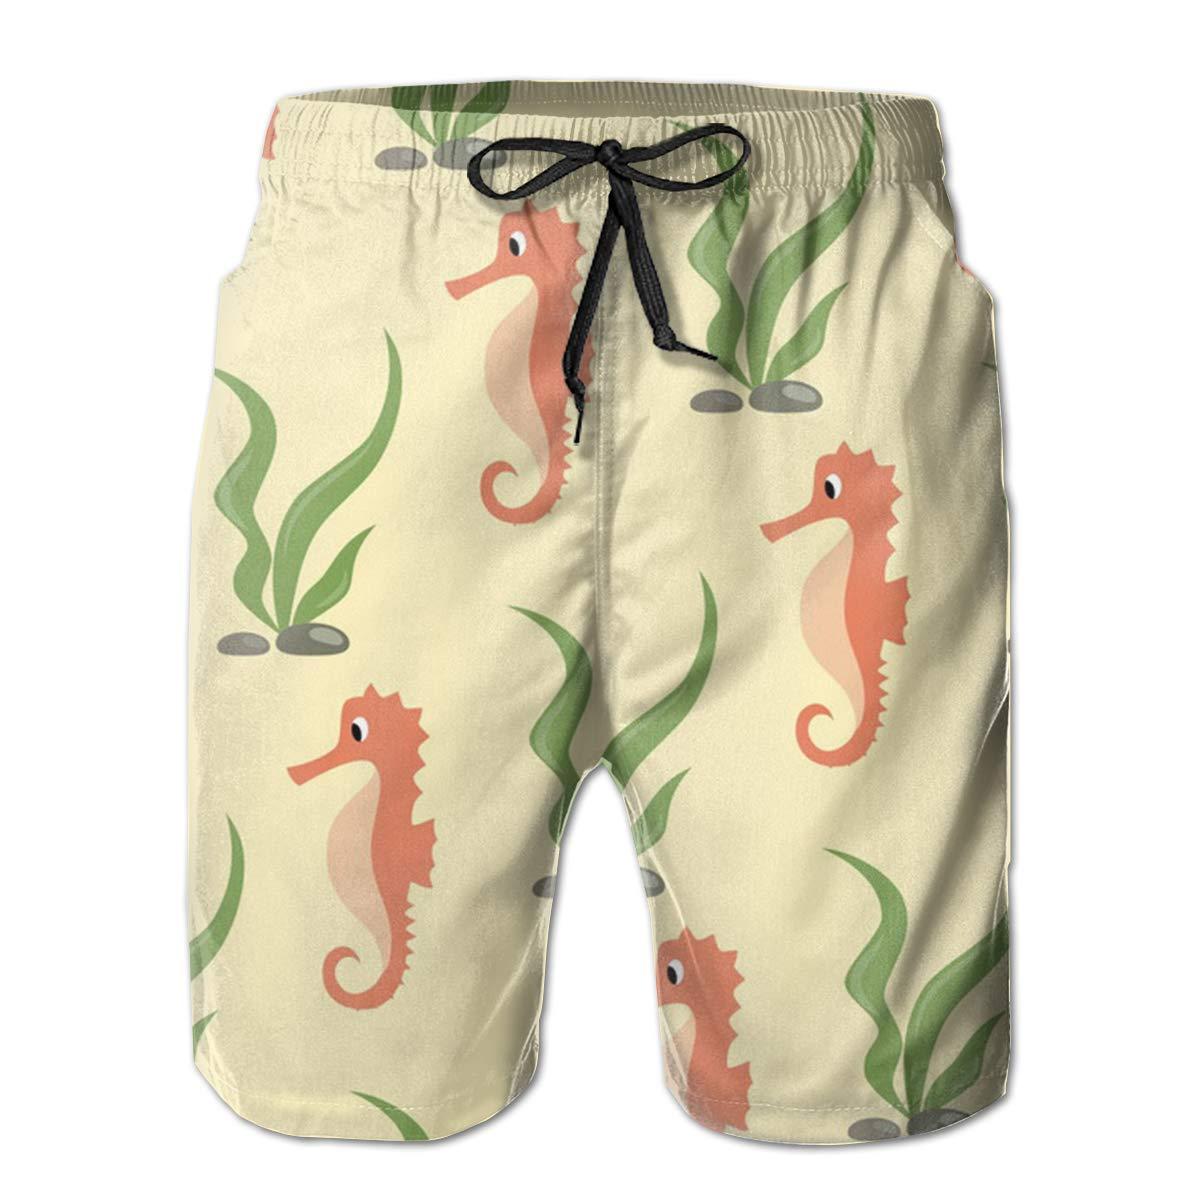 Swim Trunks Board Shorts for Men Fancy Illusion Seahorse Casual Boy Men S Shorts